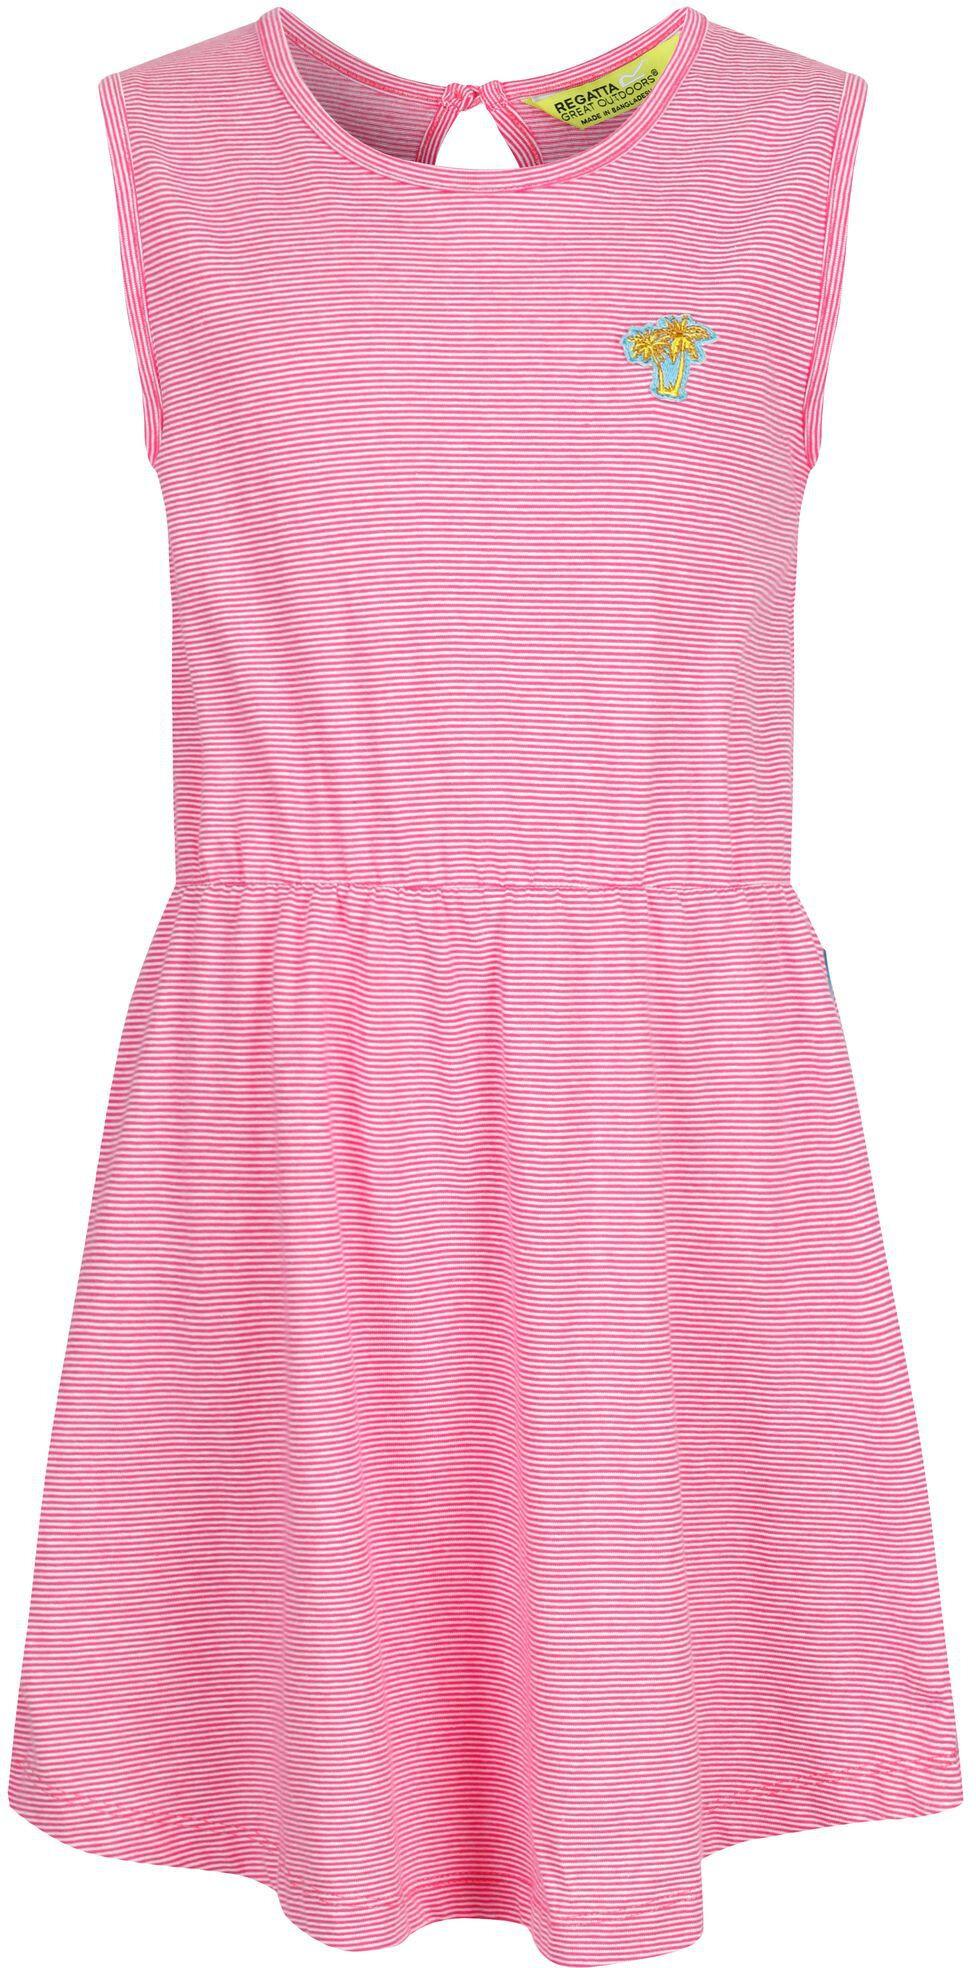 65fba0880a43 Regatta Davonna Kjole Børn pink